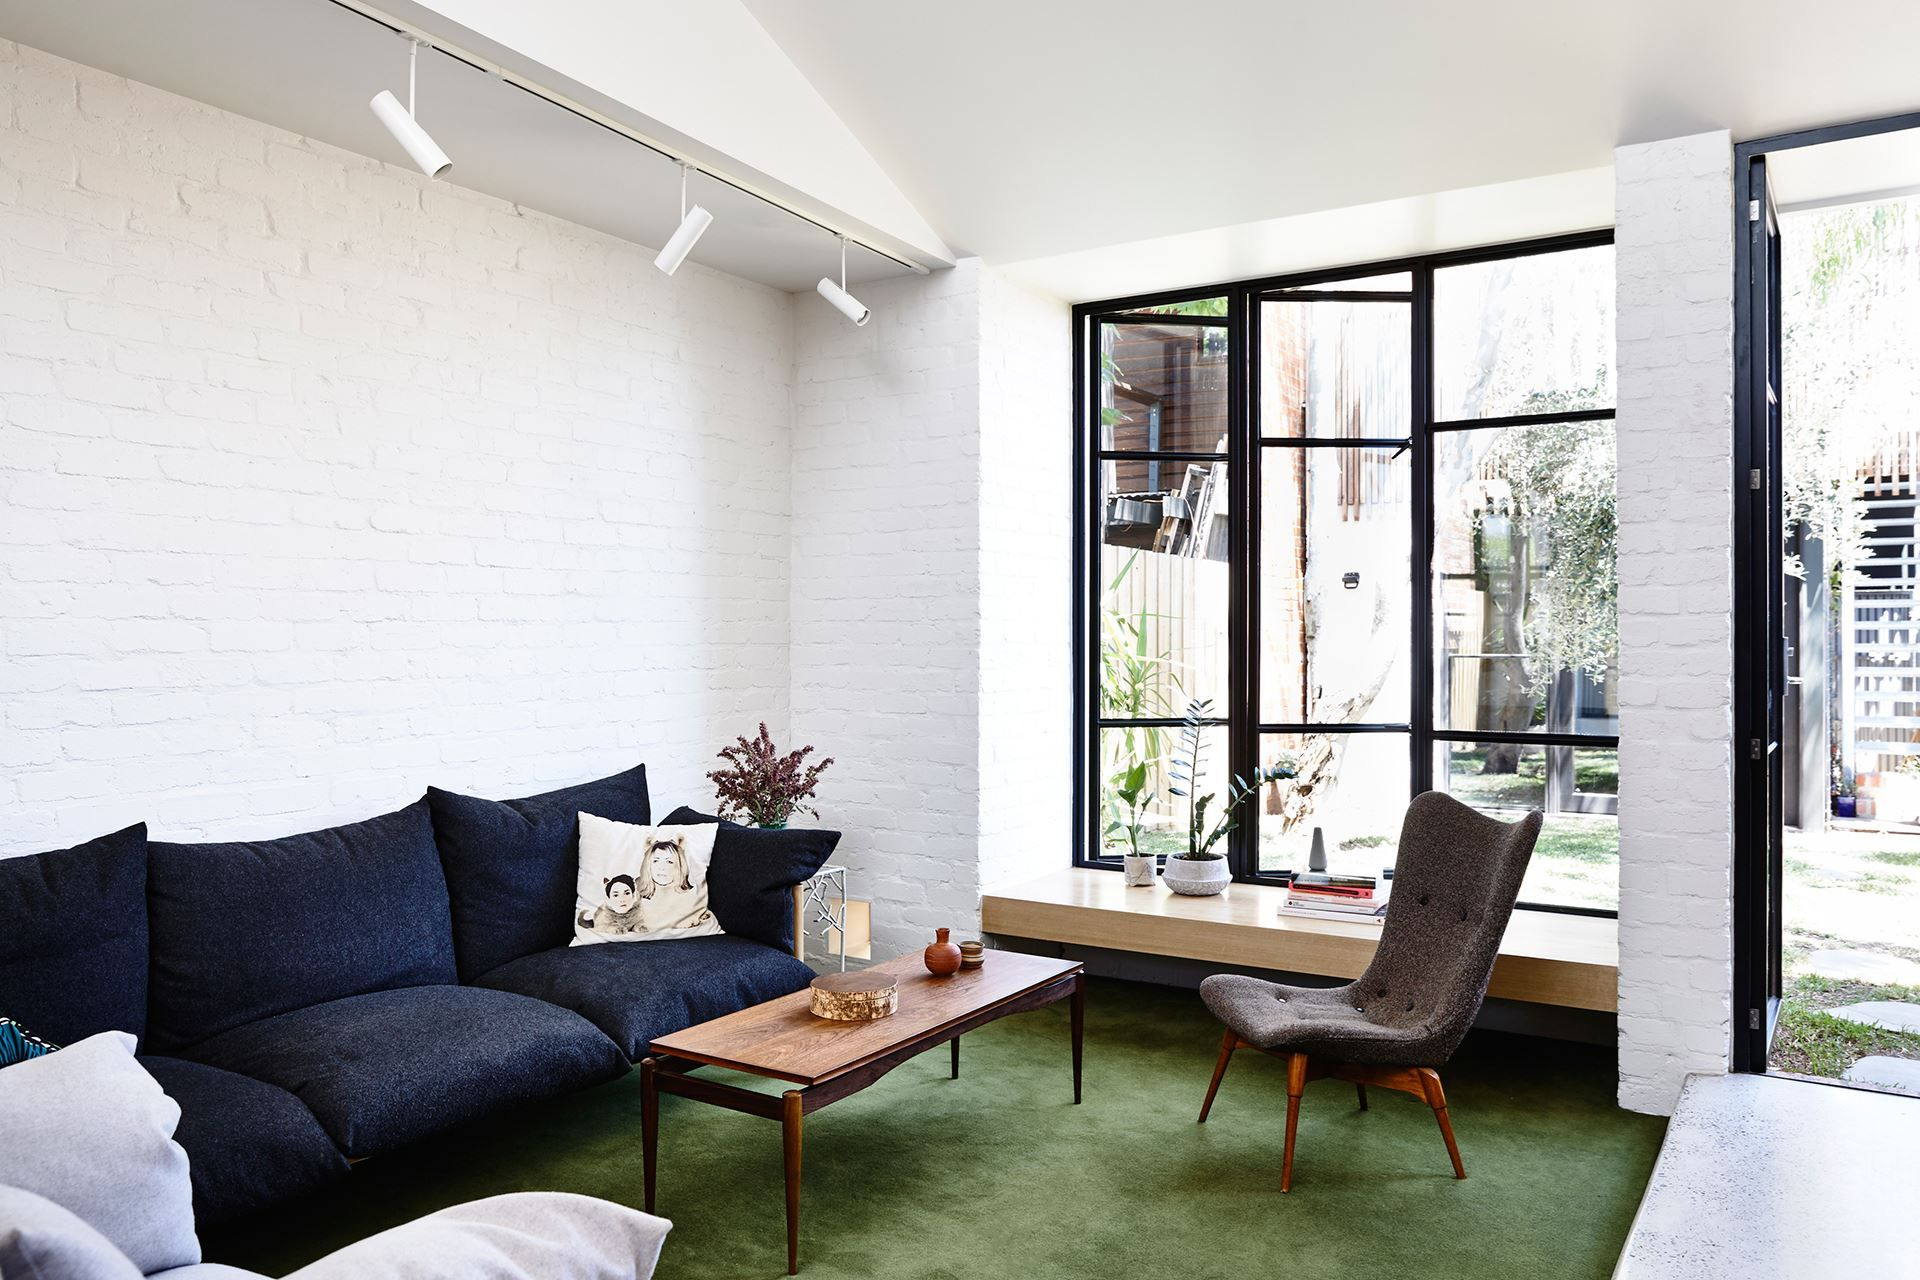 Ben Thomas Builder Building Renovation Home Renovation Living Room Inspiration Interior Design Inspiration